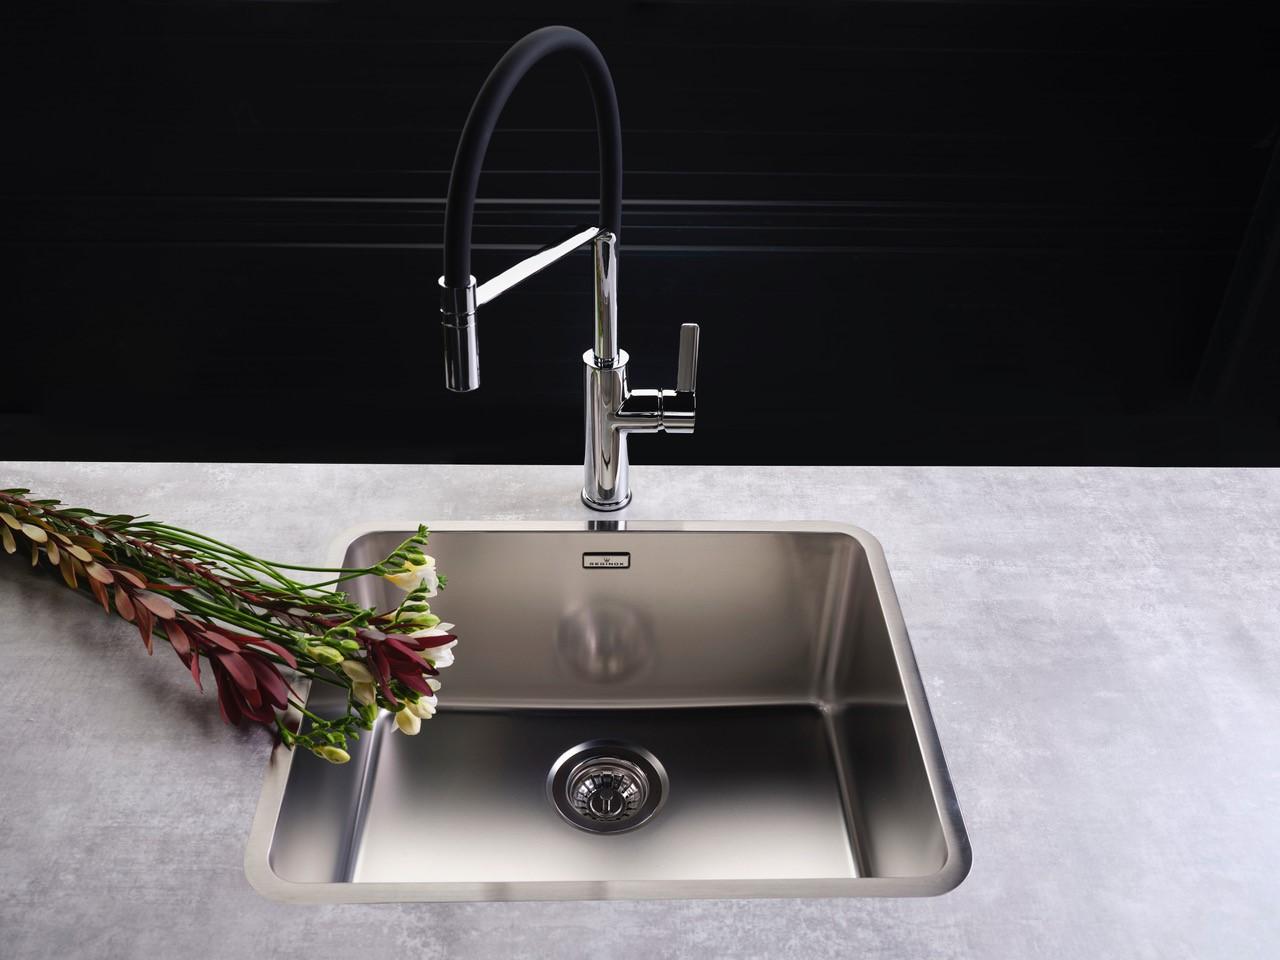 Product Spotlight: Rethinking the sink